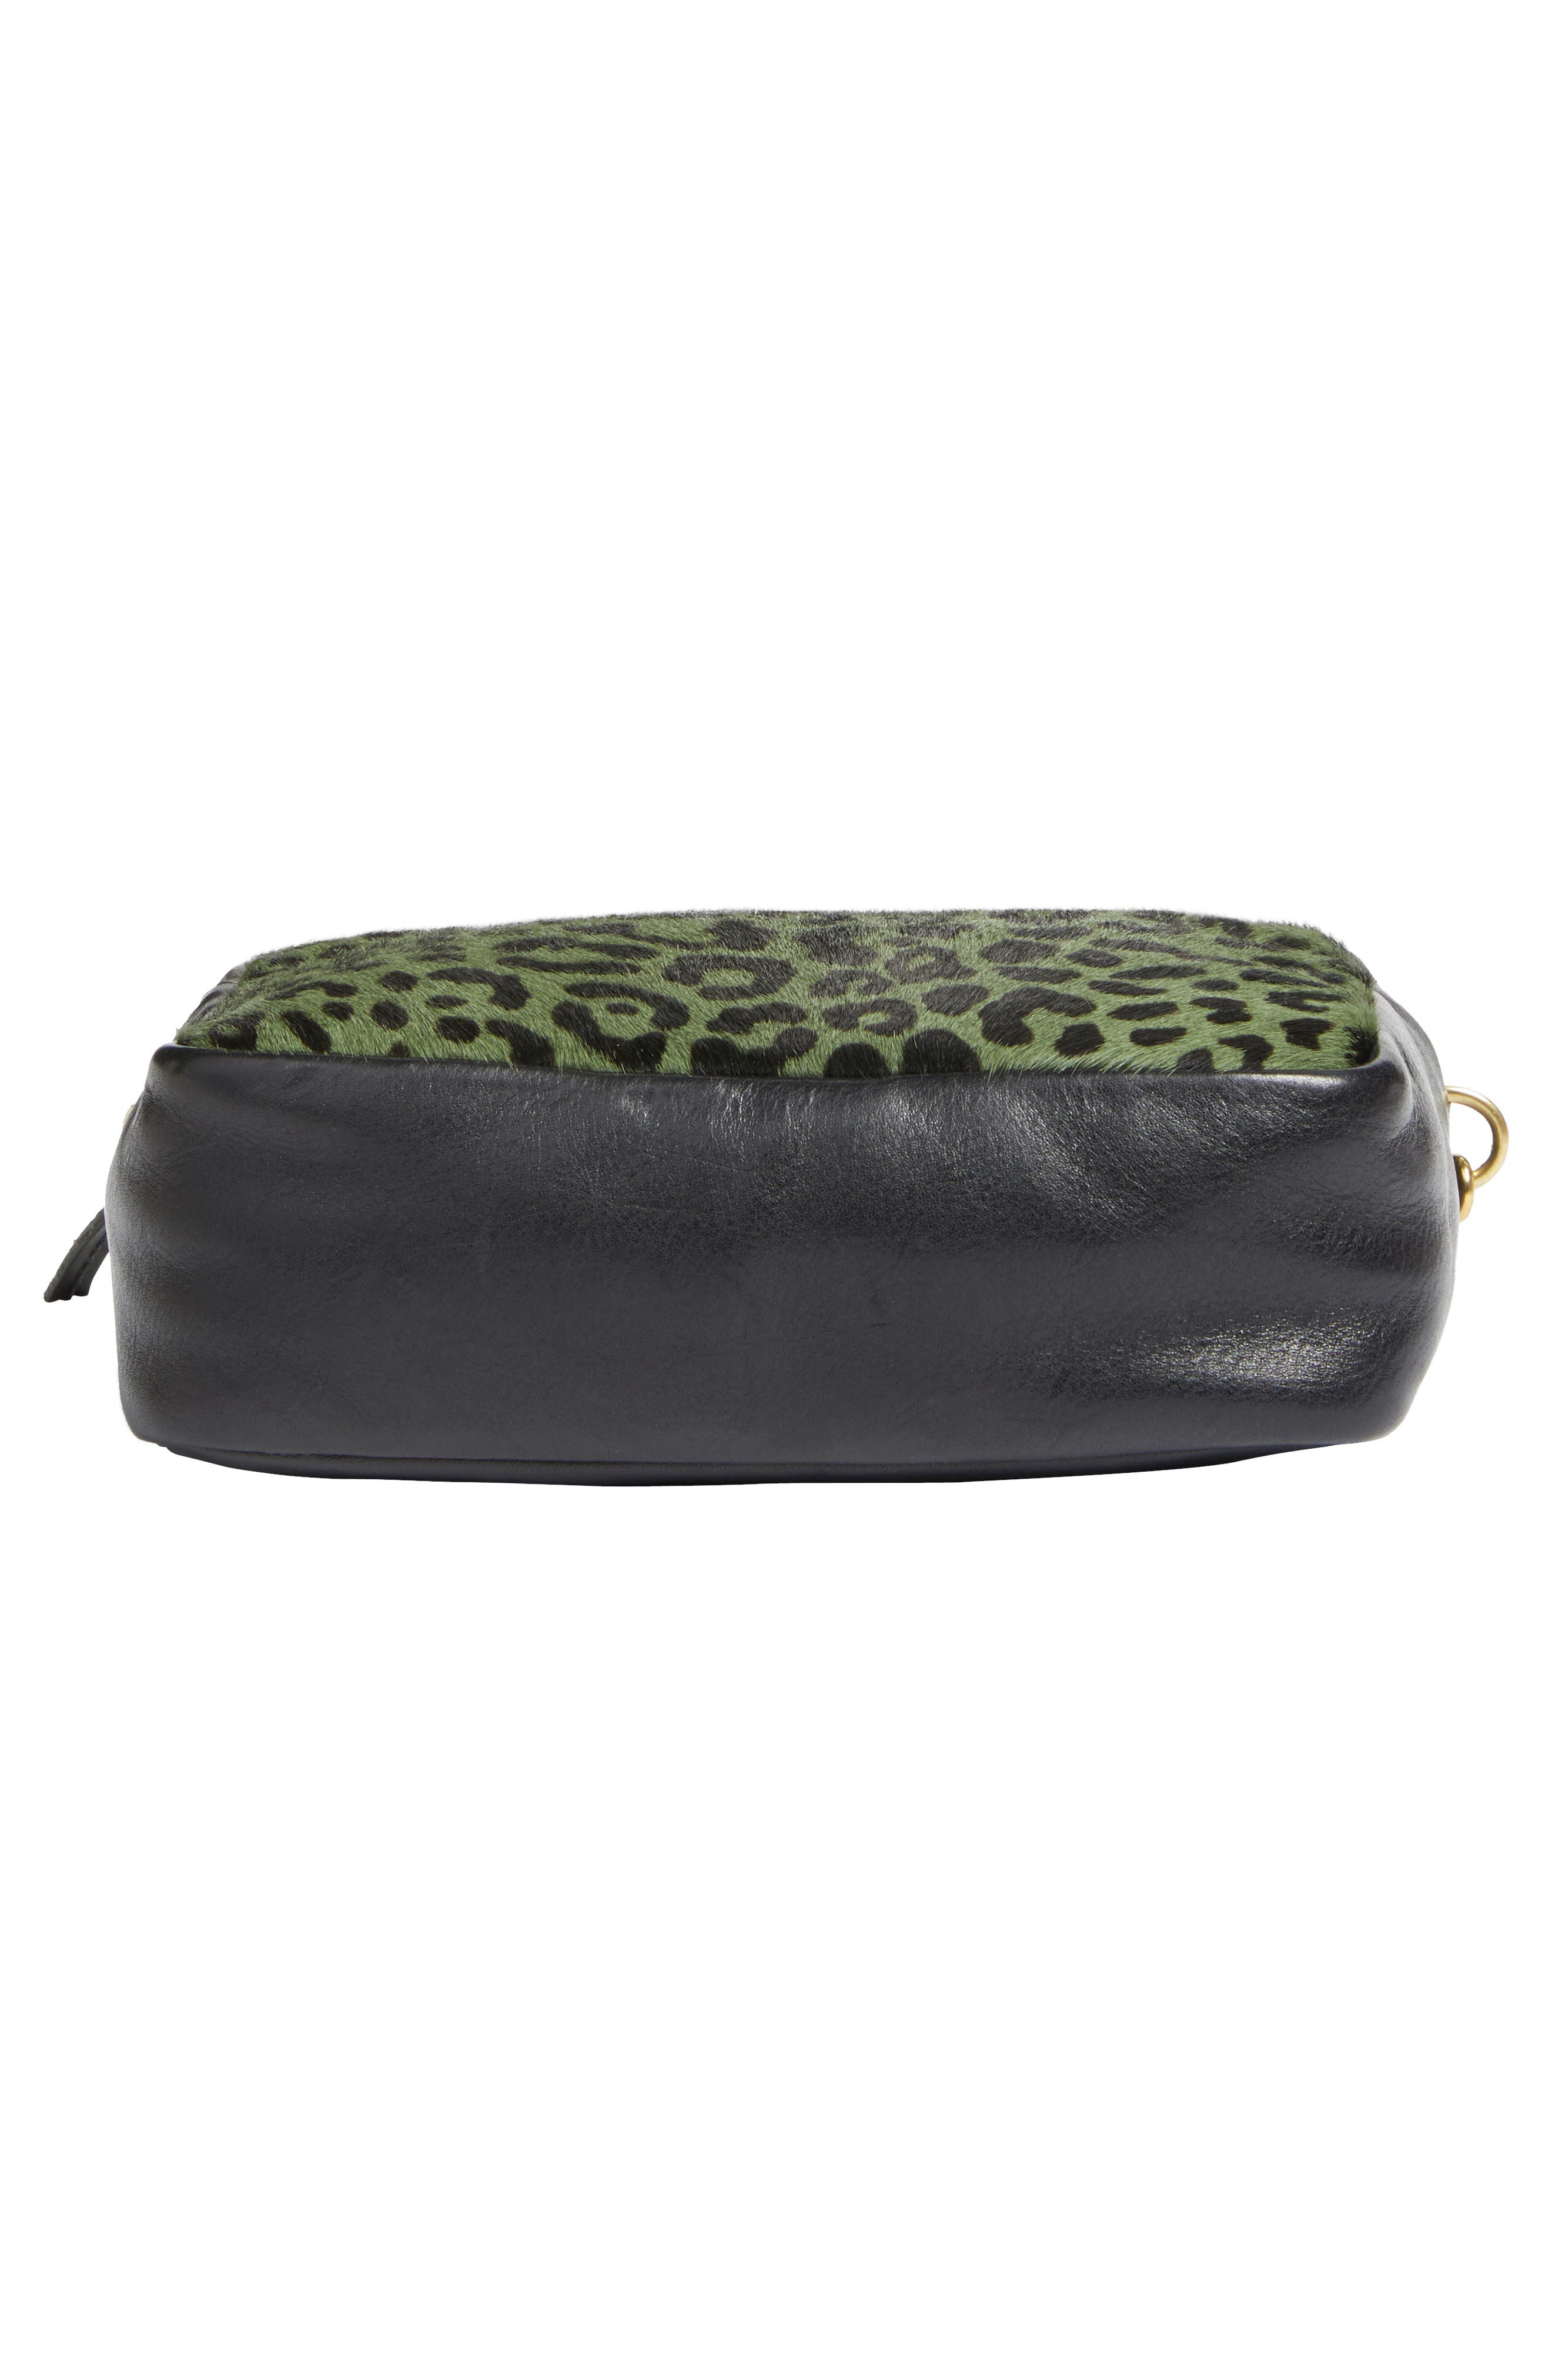 Midi Sac Leather & Genuine Calf Hair Shoulder Bag,                             Alternate thumbnail 6, color,                             Agave Leopard